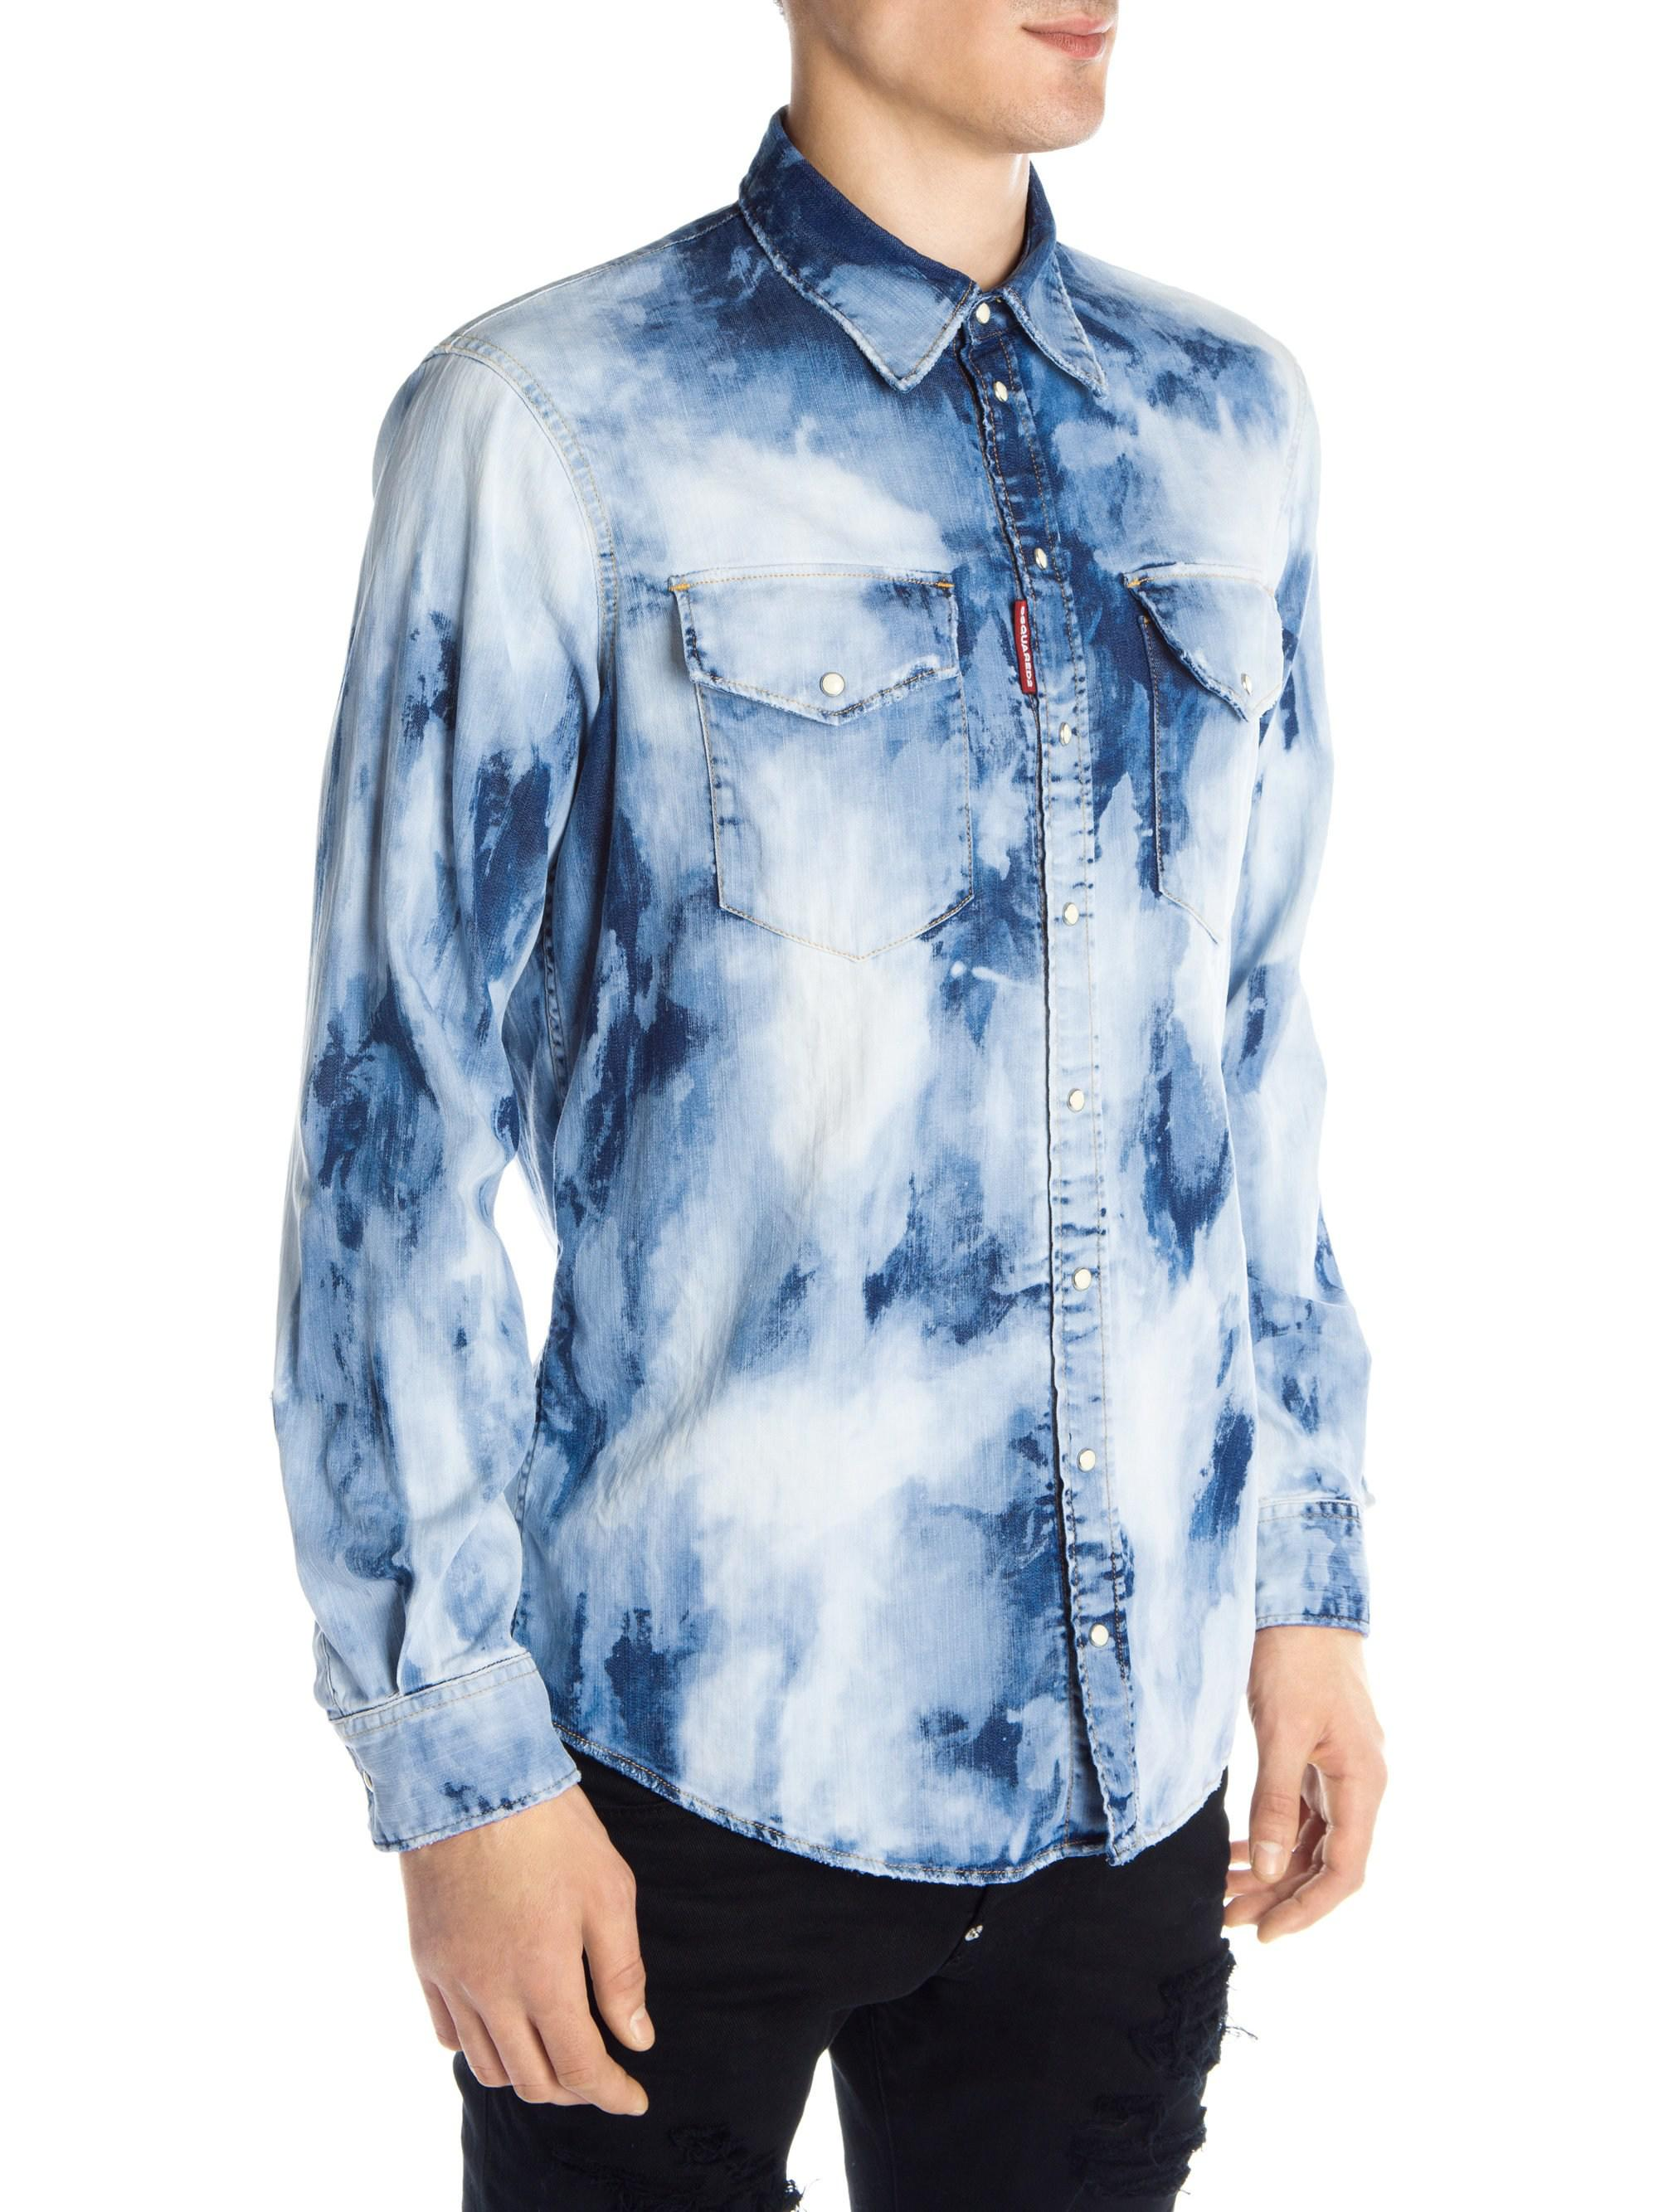 3120a162de9 Lyst - Dsquared² Denim Bleached Shirt in Blue for Men